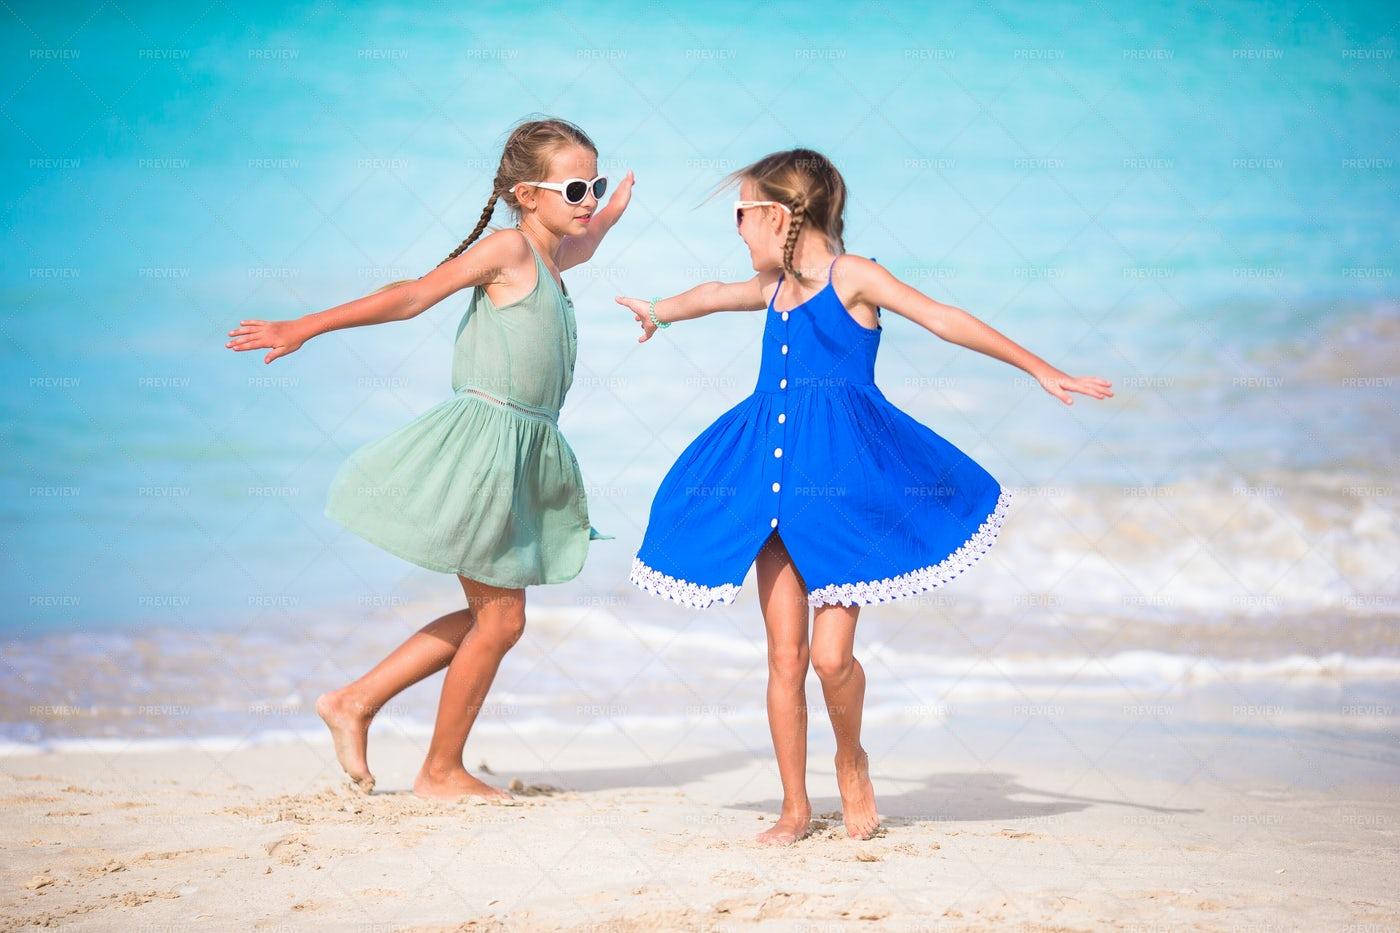 Little Girls Having Fun: Stock Photos